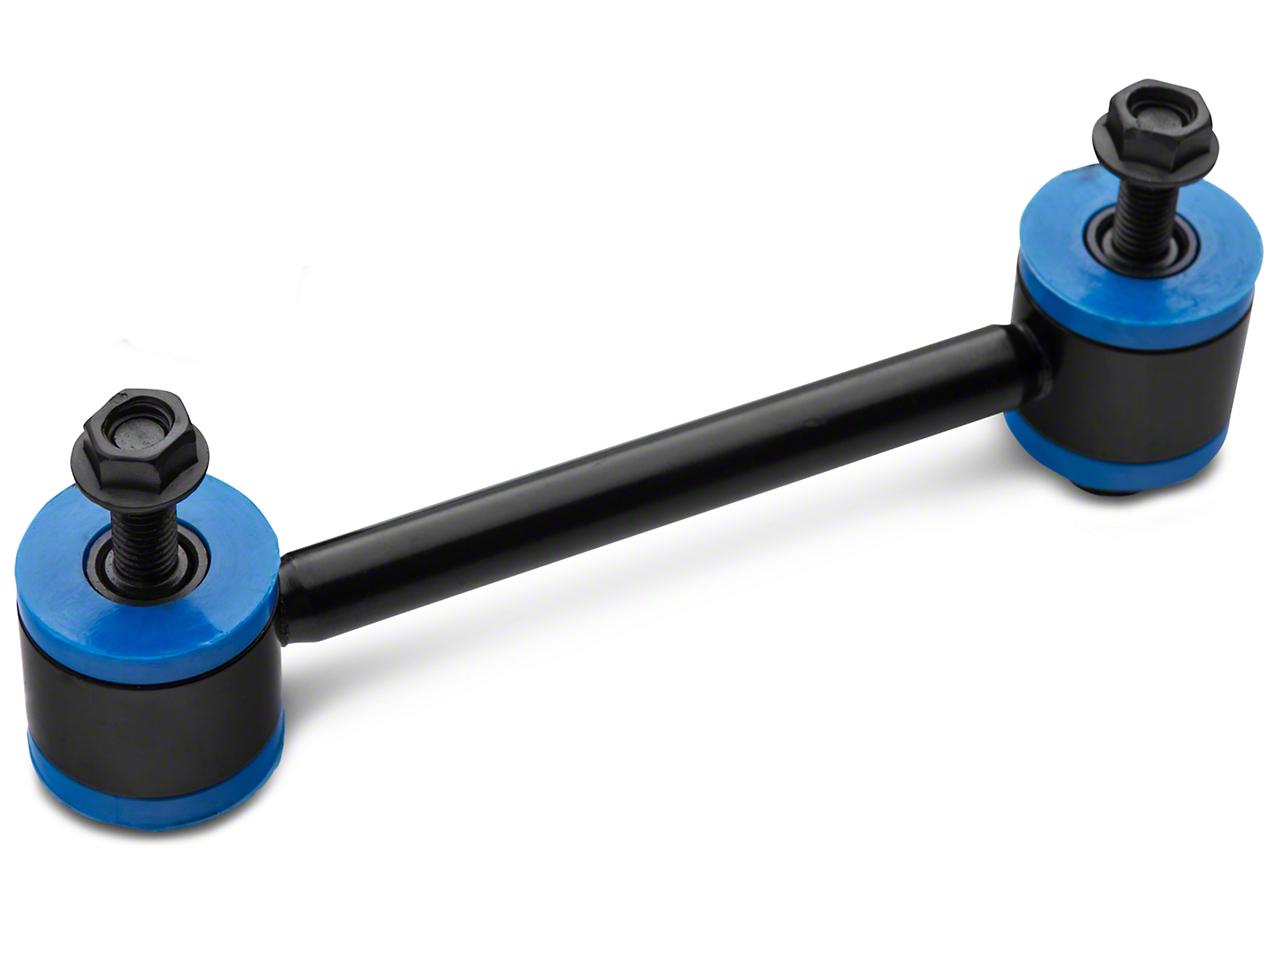 OPR Replacement Rear Sway Bar Link Kit (97-06 Wrangler TJ)